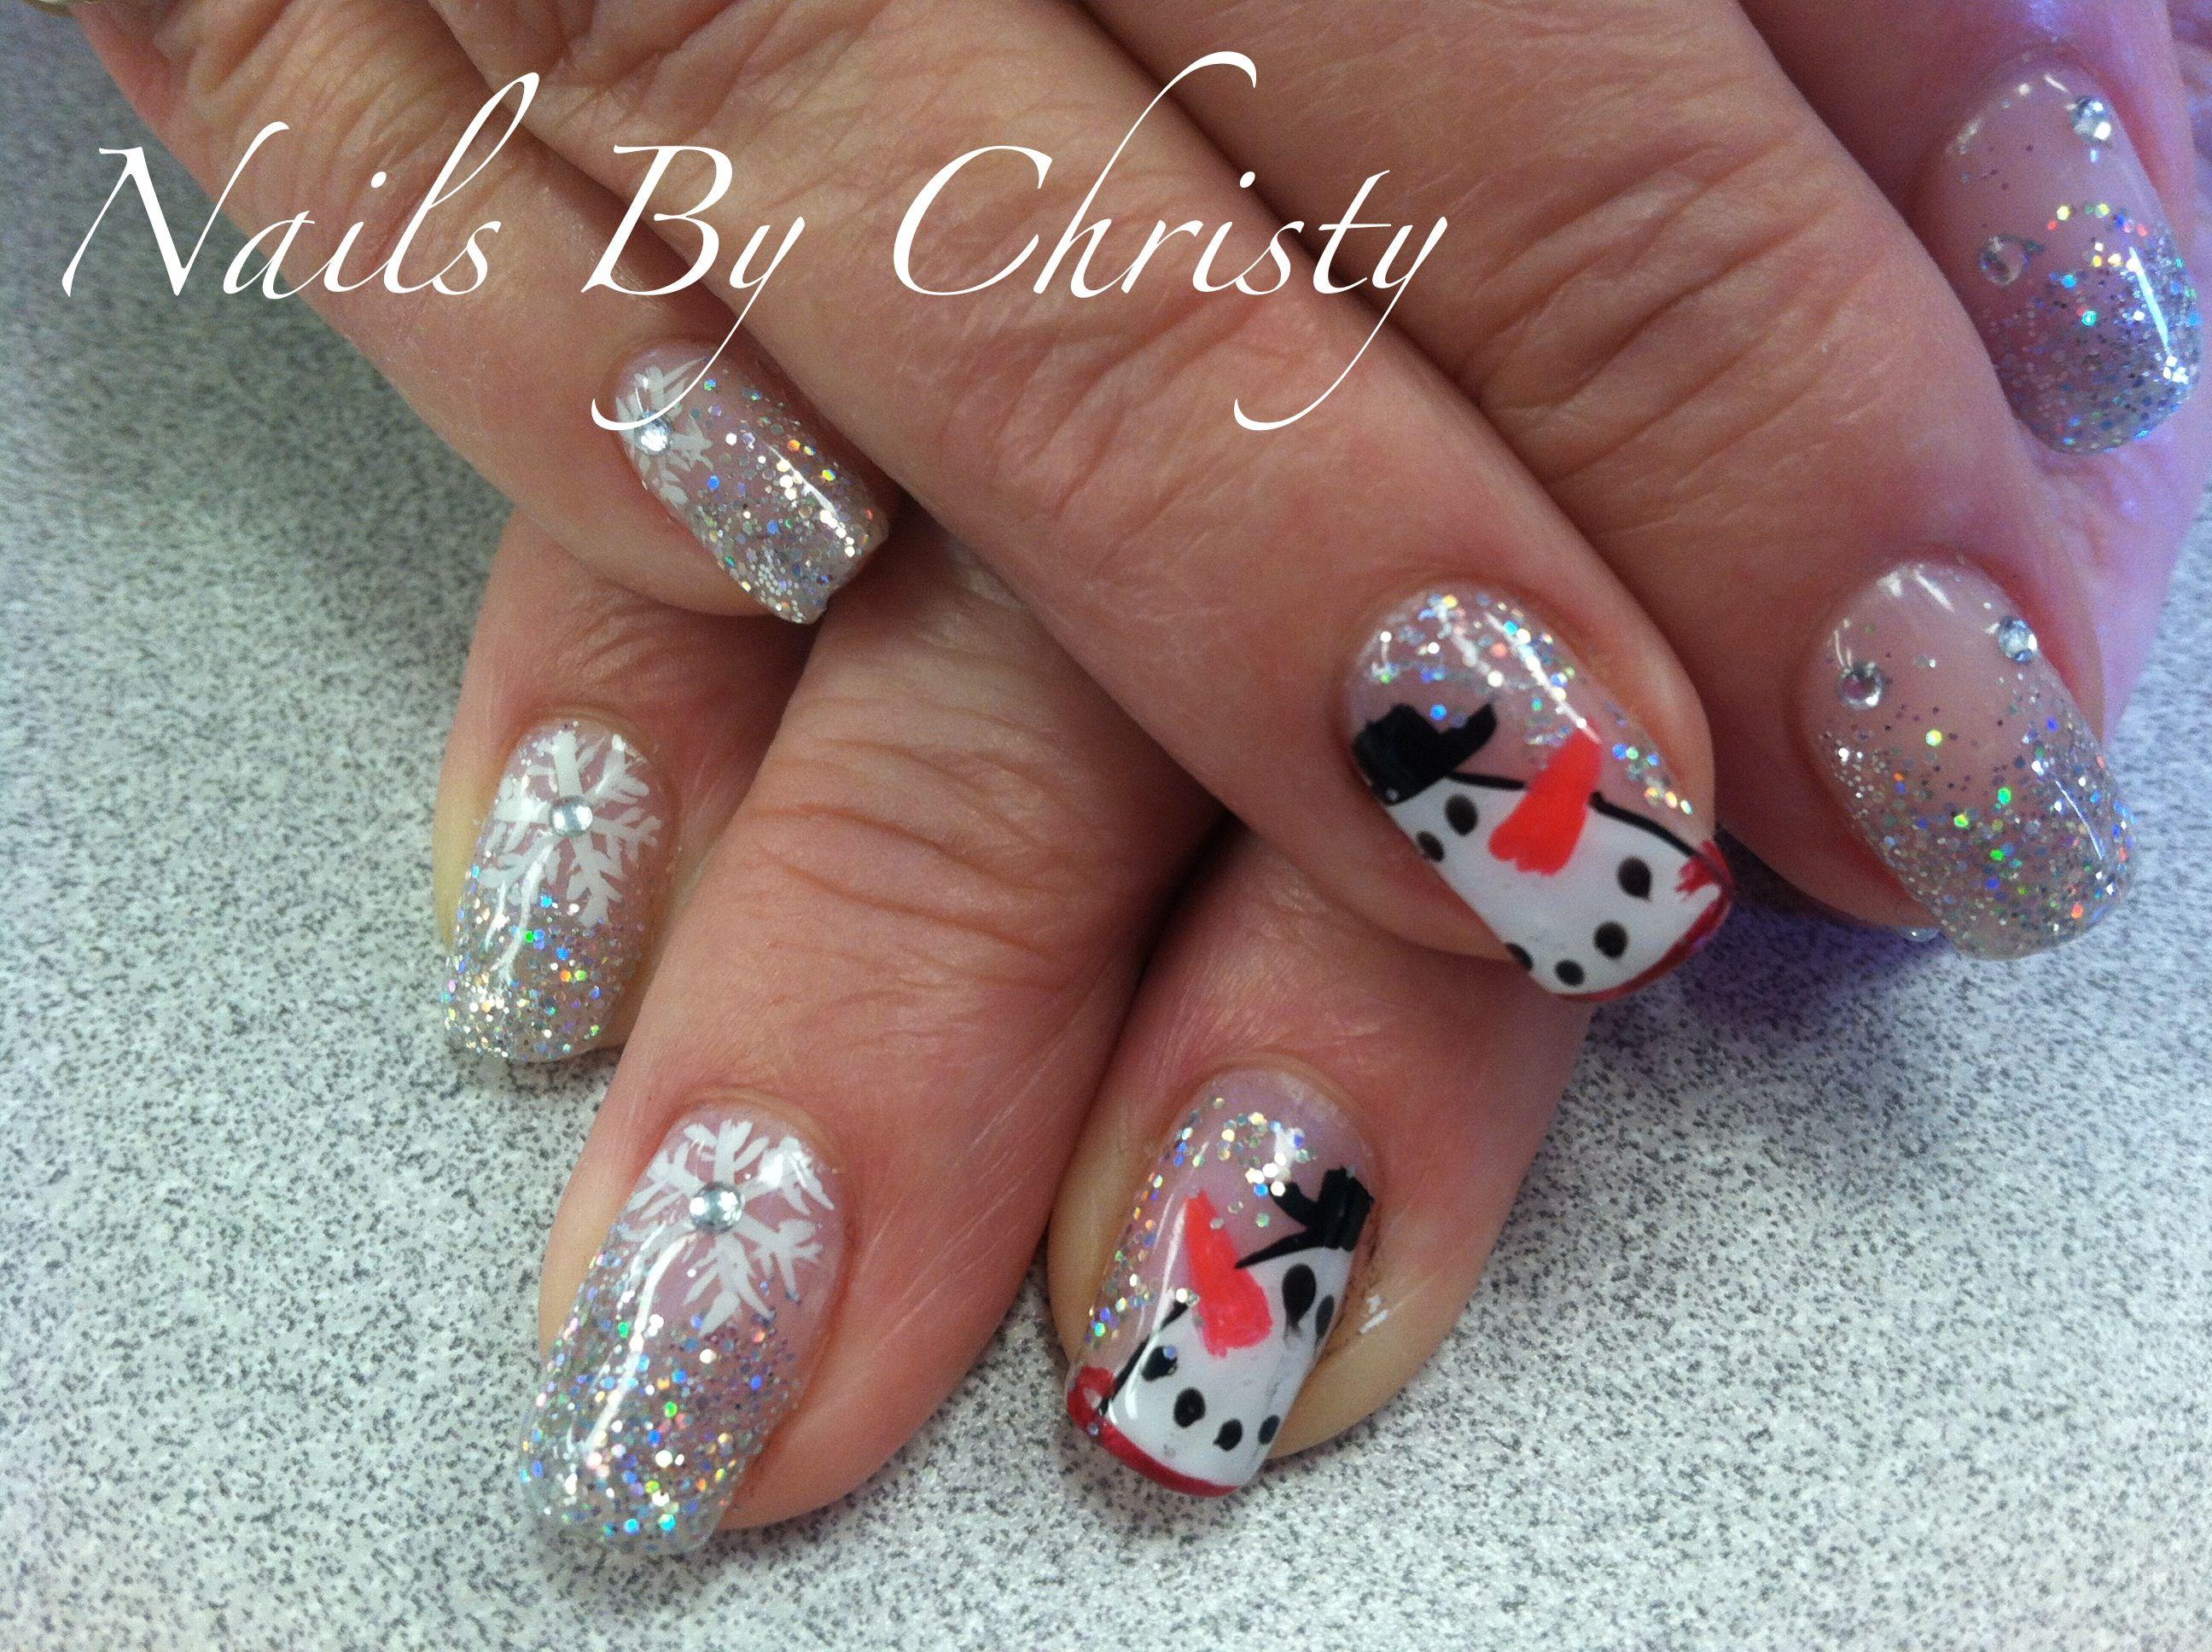 Sparkly Snowman Winter Art Shellac Nails | Shellac nails ...